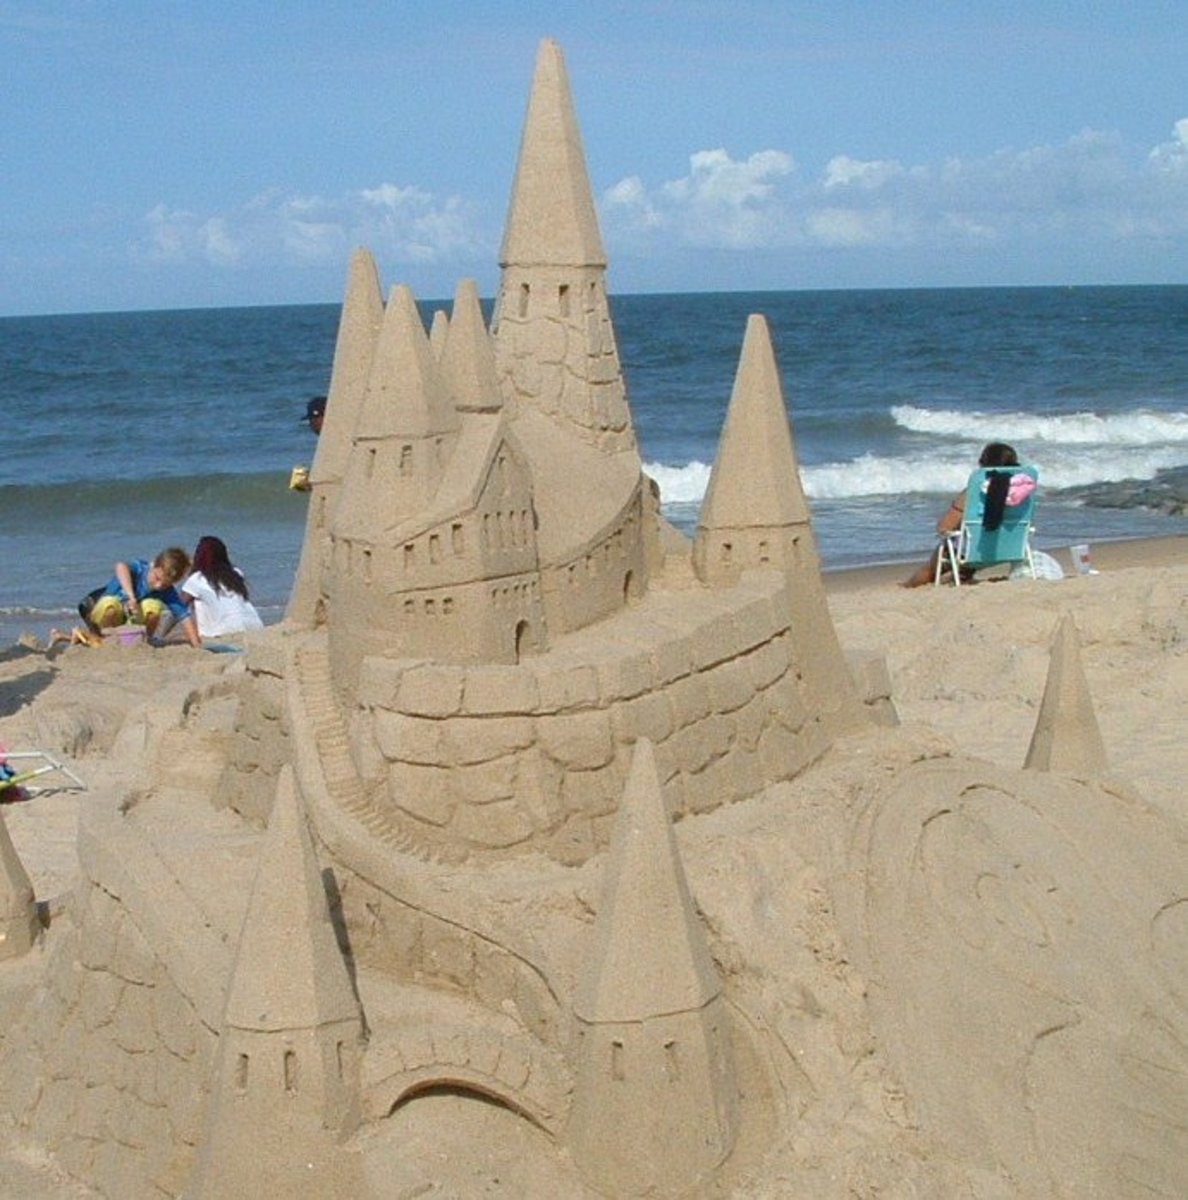 Building Sand Castles : How to build sand castles sculptures with kids wehavekids